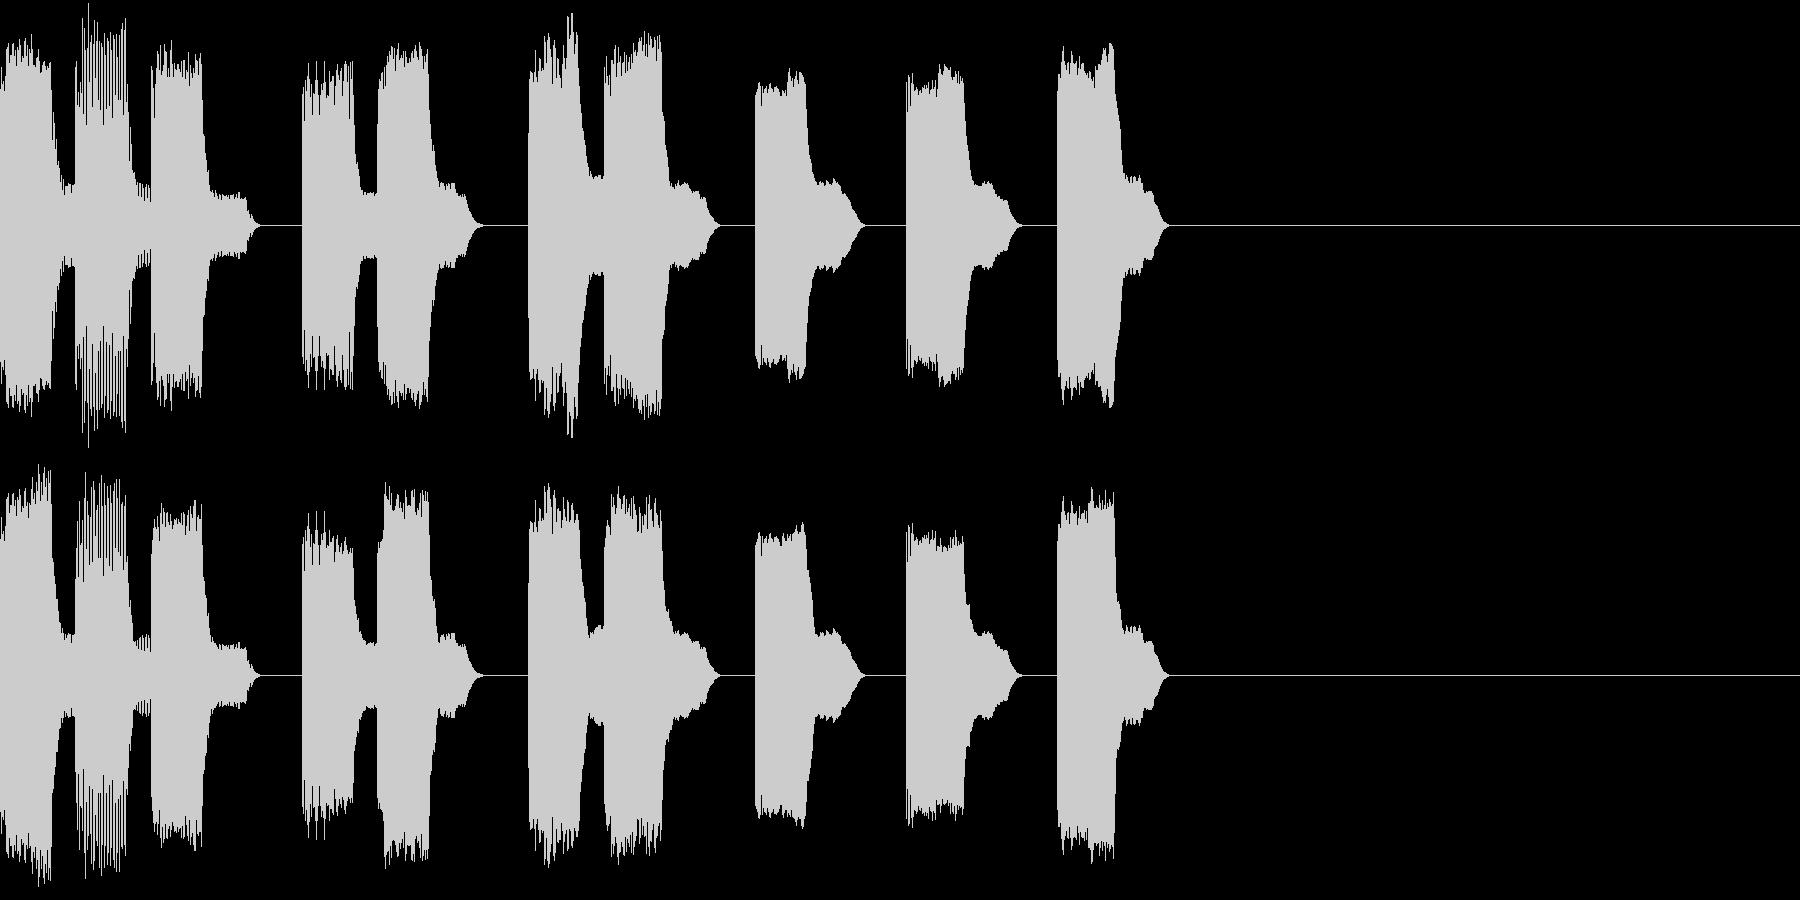 RetroGame 勝利した時の音の未再生の波形